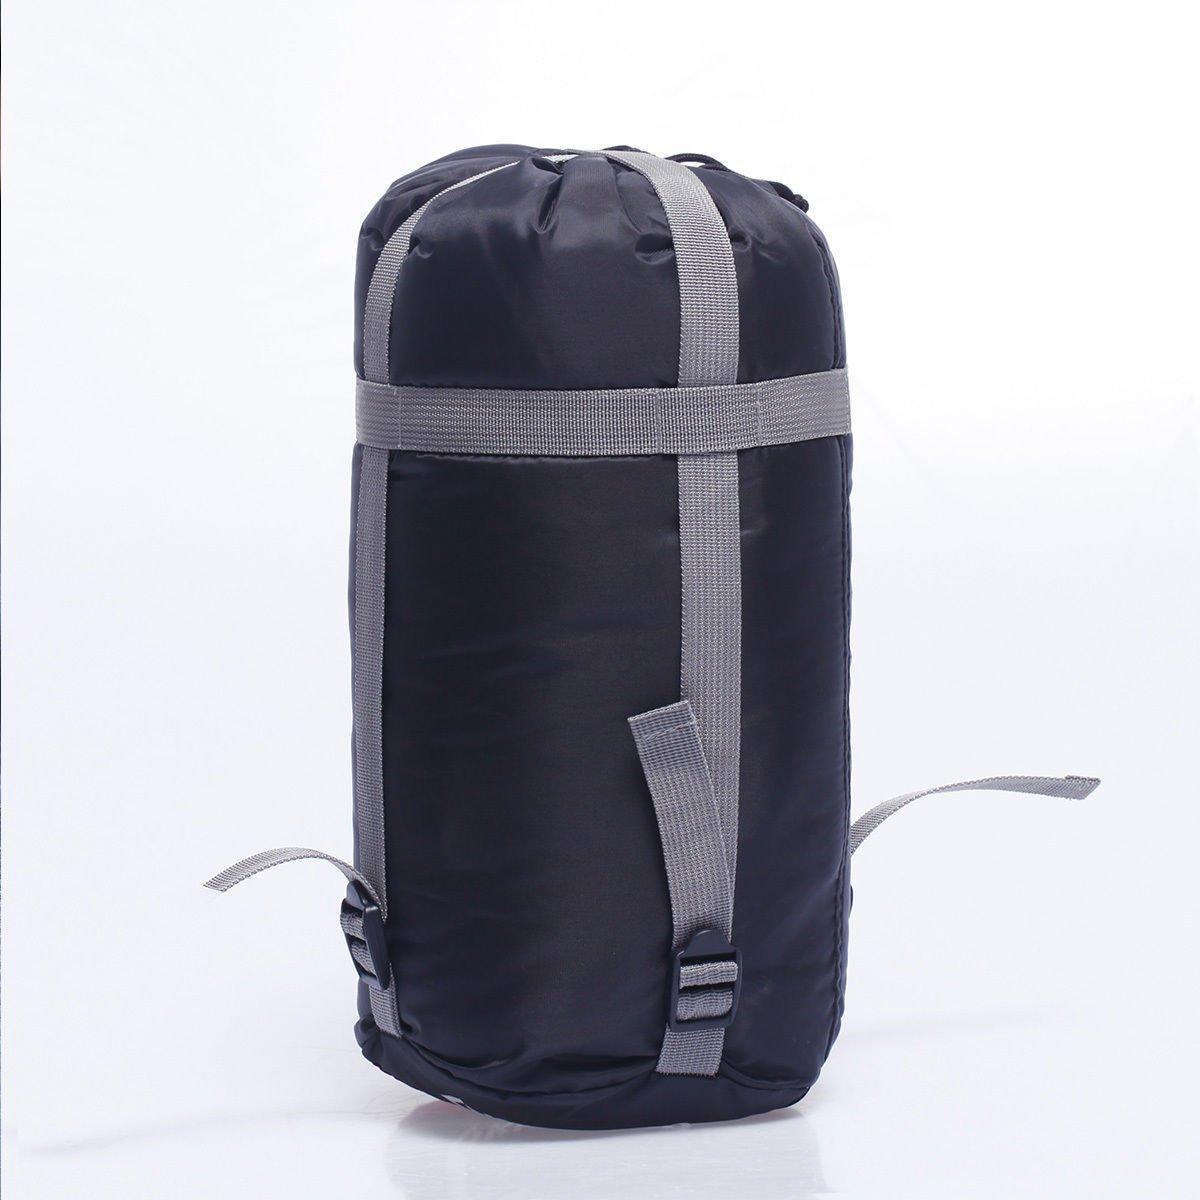 Compact Portable Ultralight Mummy 2-Season Sleeping Bag Variation Size